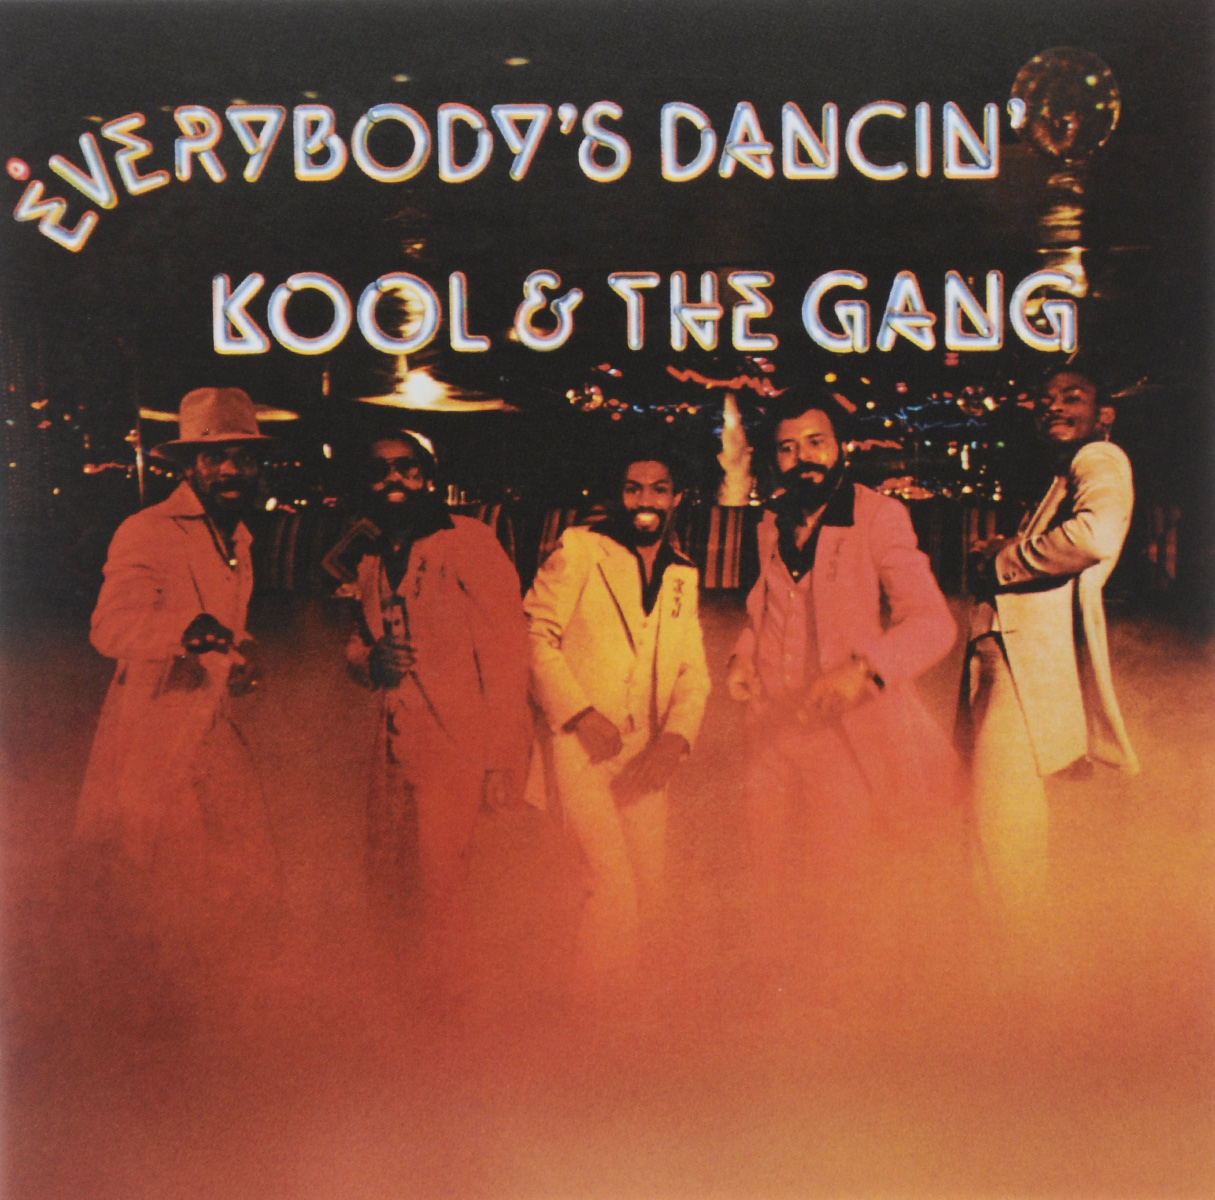 Kool & The Gang Kool & The Gang. Everybody's Dancin' kool